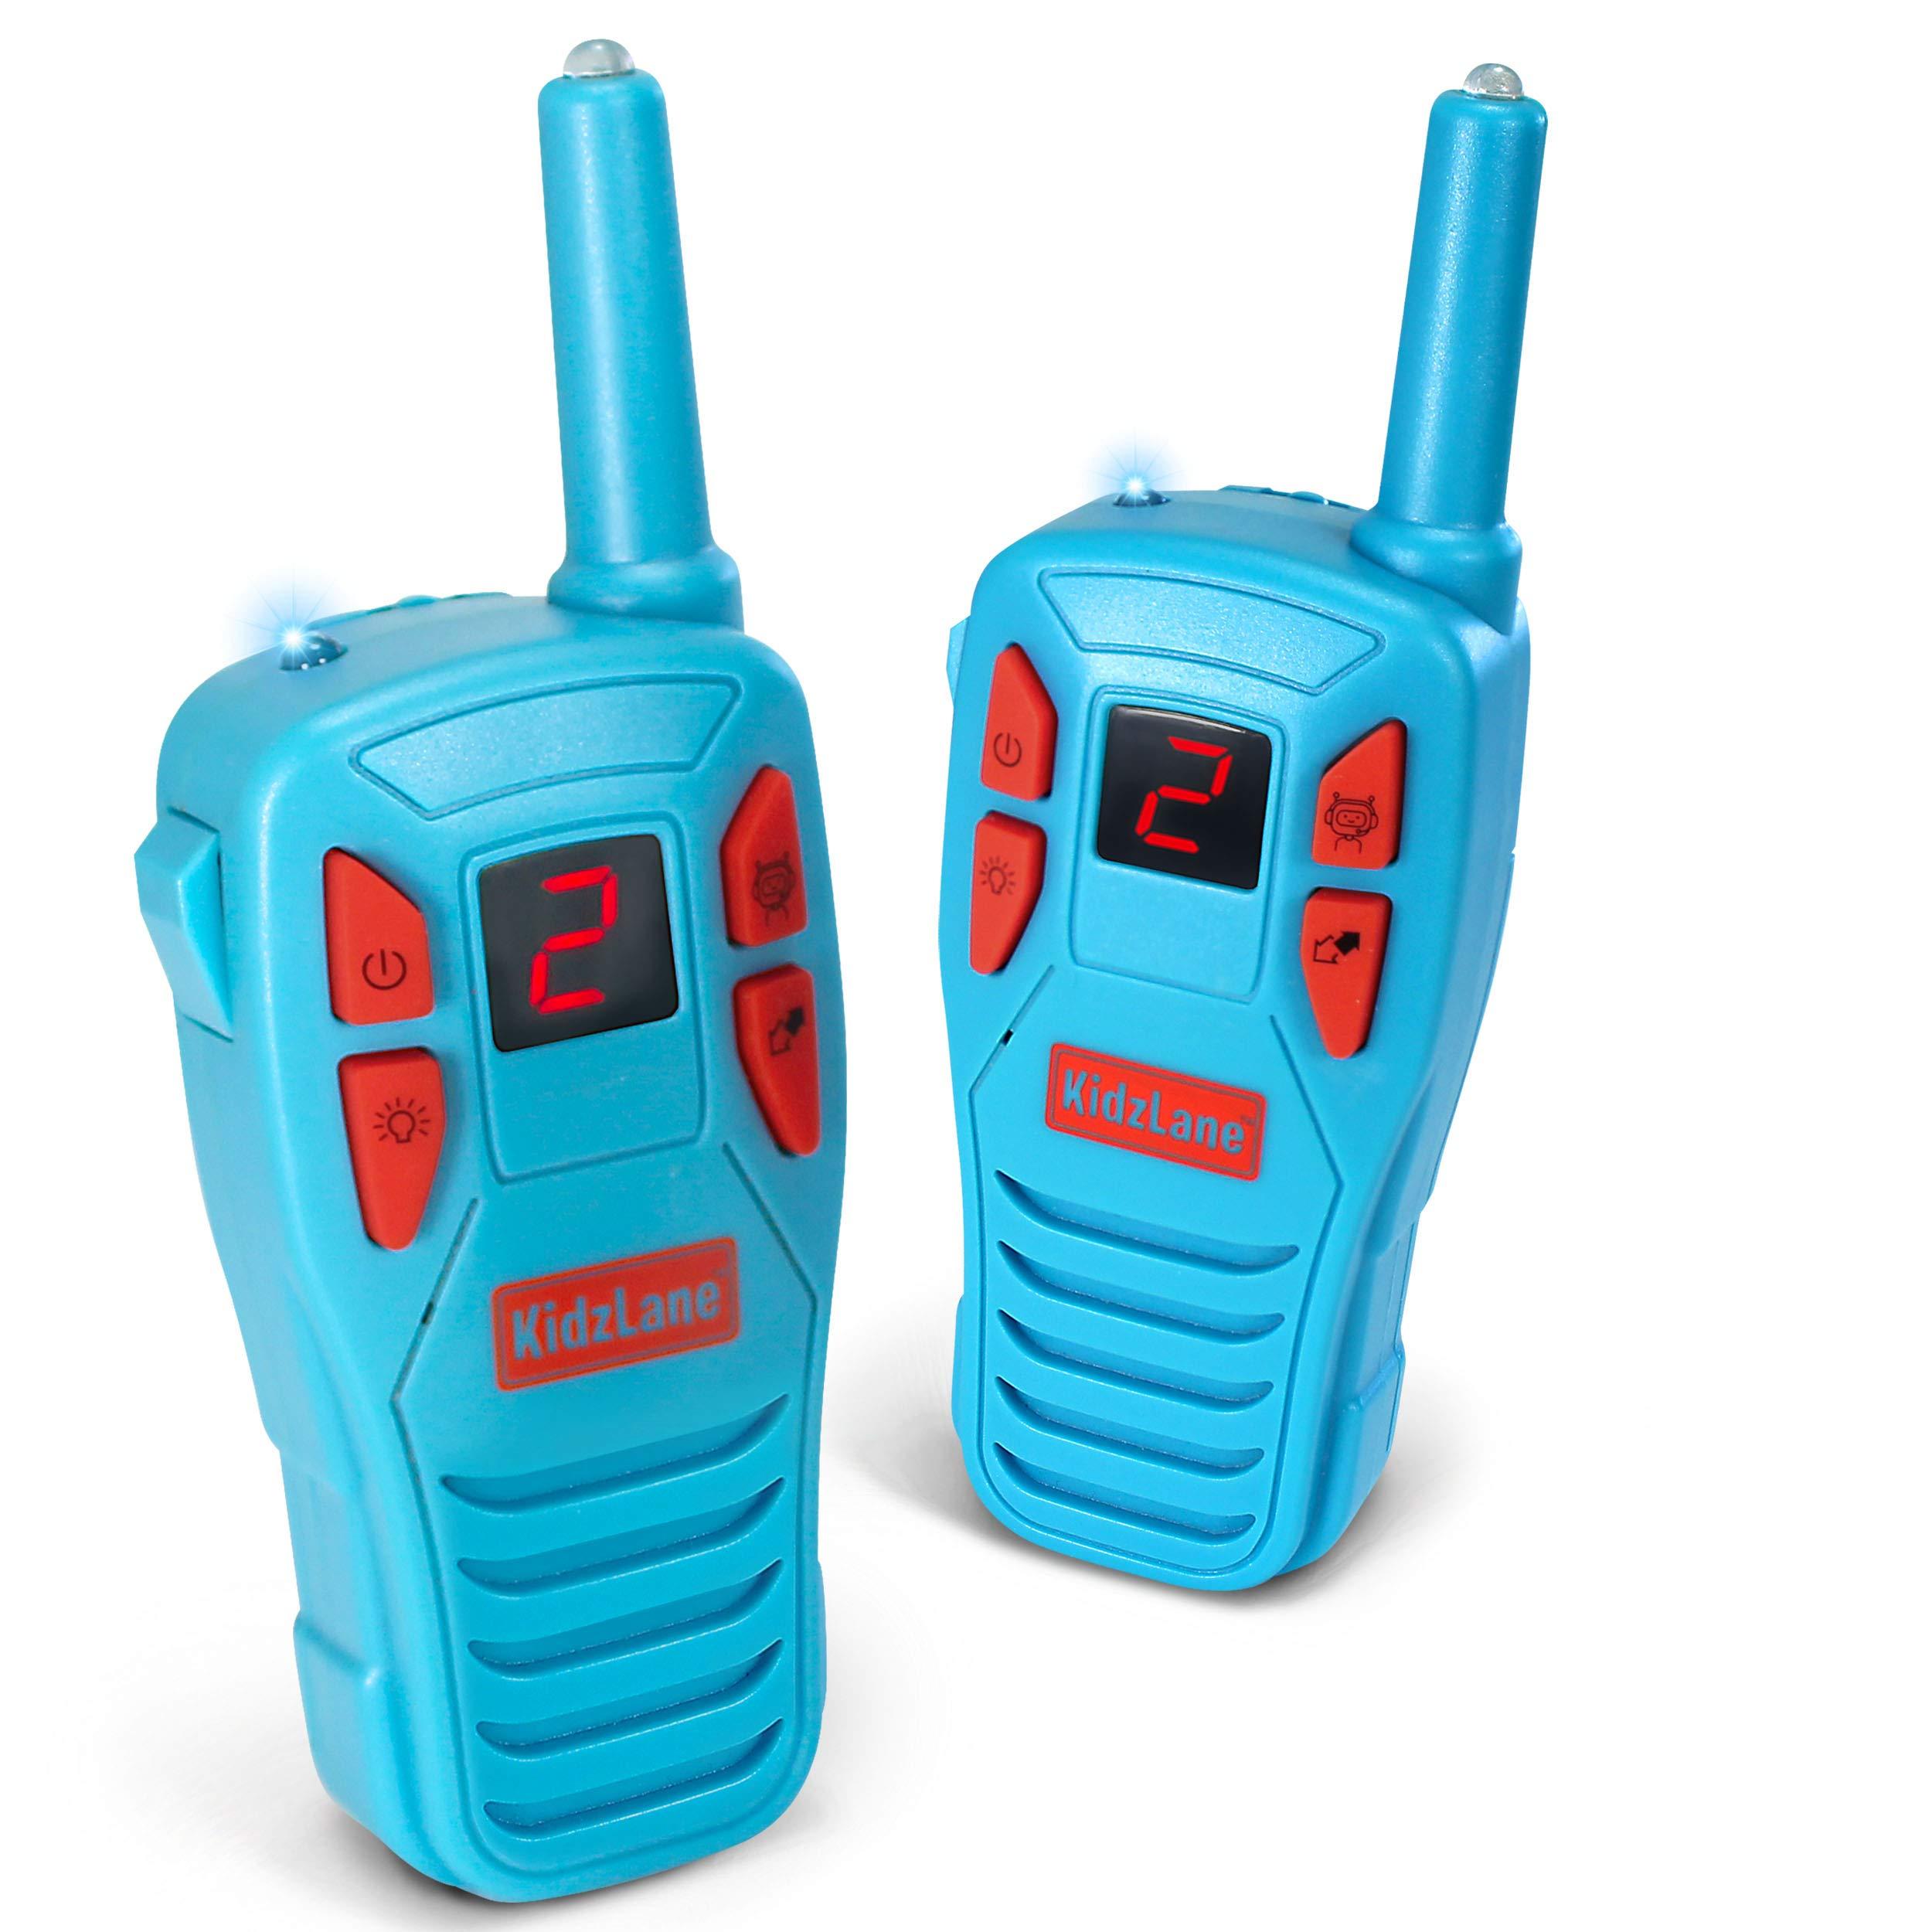 Kidzlane Voice Changing Walkie Talkies for Kids - 2 Mile Range, 8 Channels, Flashlight, & Call Alert by Kidzlane (Image #1)